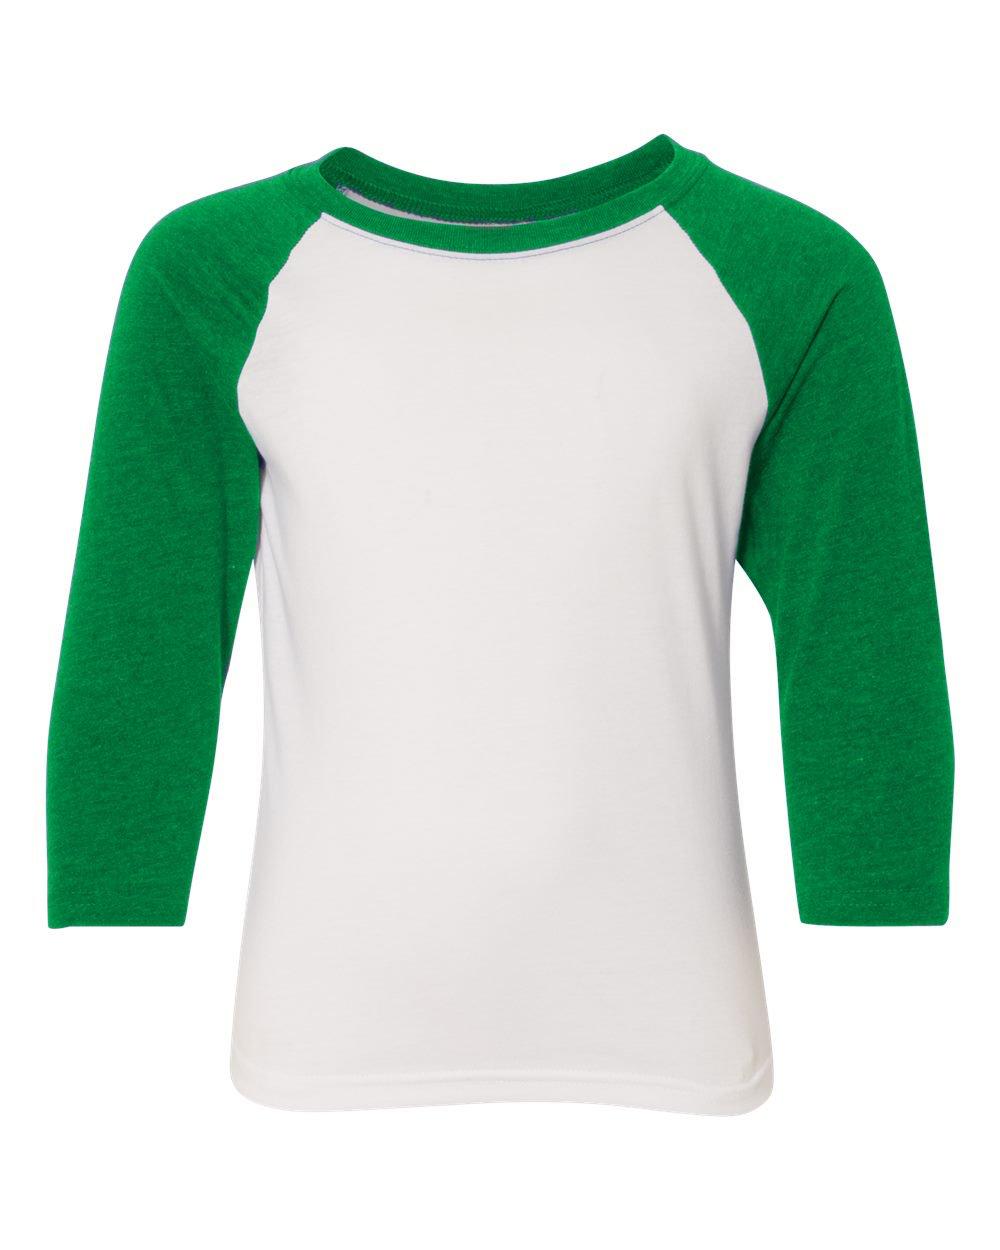 KAMAL OHAVA Youth Premium 3/4 Sleeve Baseball T-Shirt, M, Kelly/White